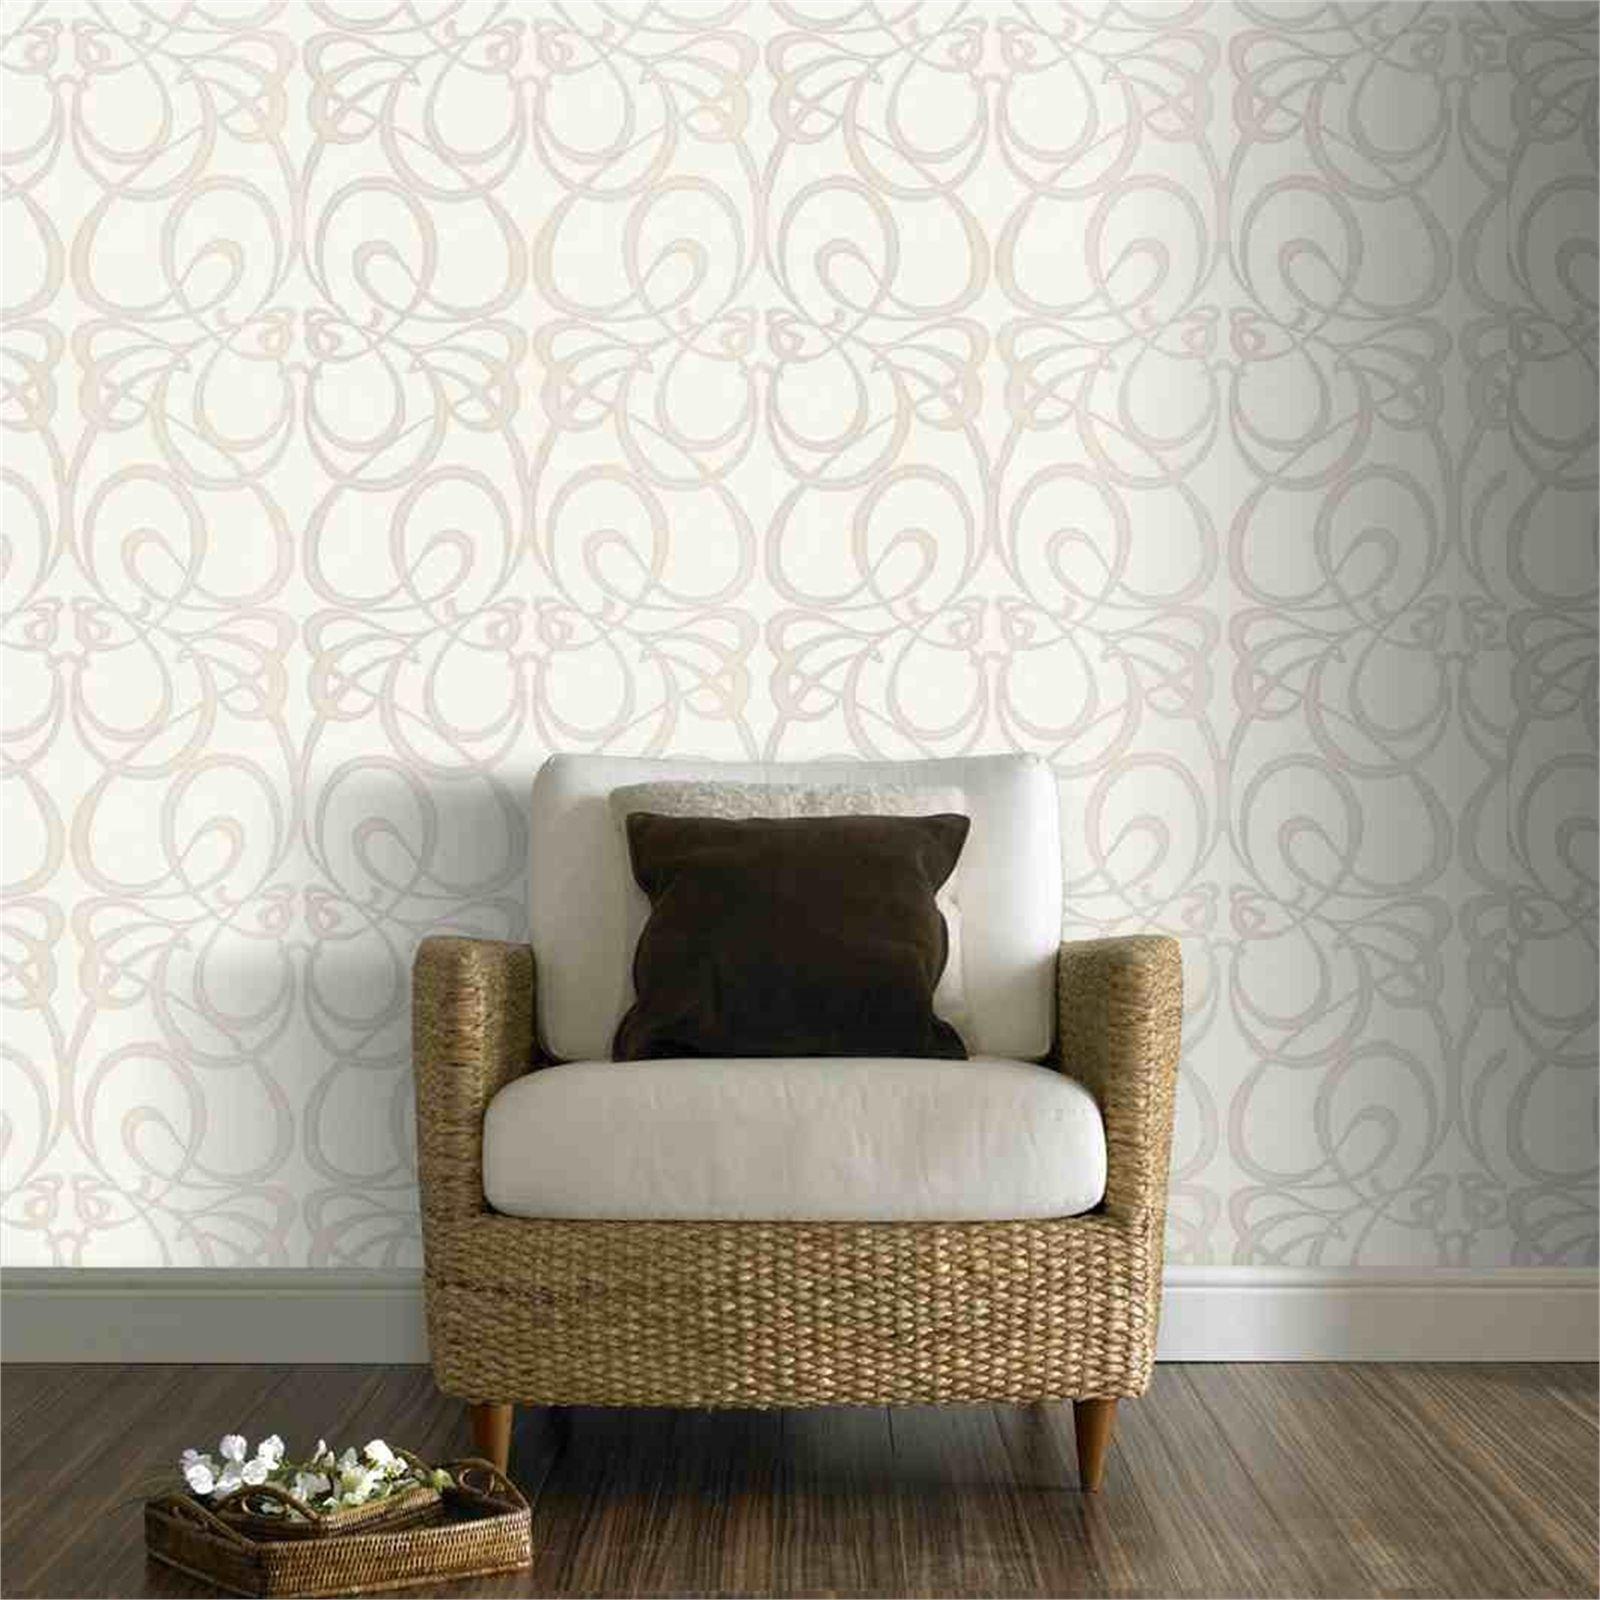 Find Superfresco Easy Jazz Art D Amp 233 Cor Wallpaper 52cmx10m White At Bunnings Warehouse White And Silver Wallpaper Contemporary Wallpaper Wallpaper Decor